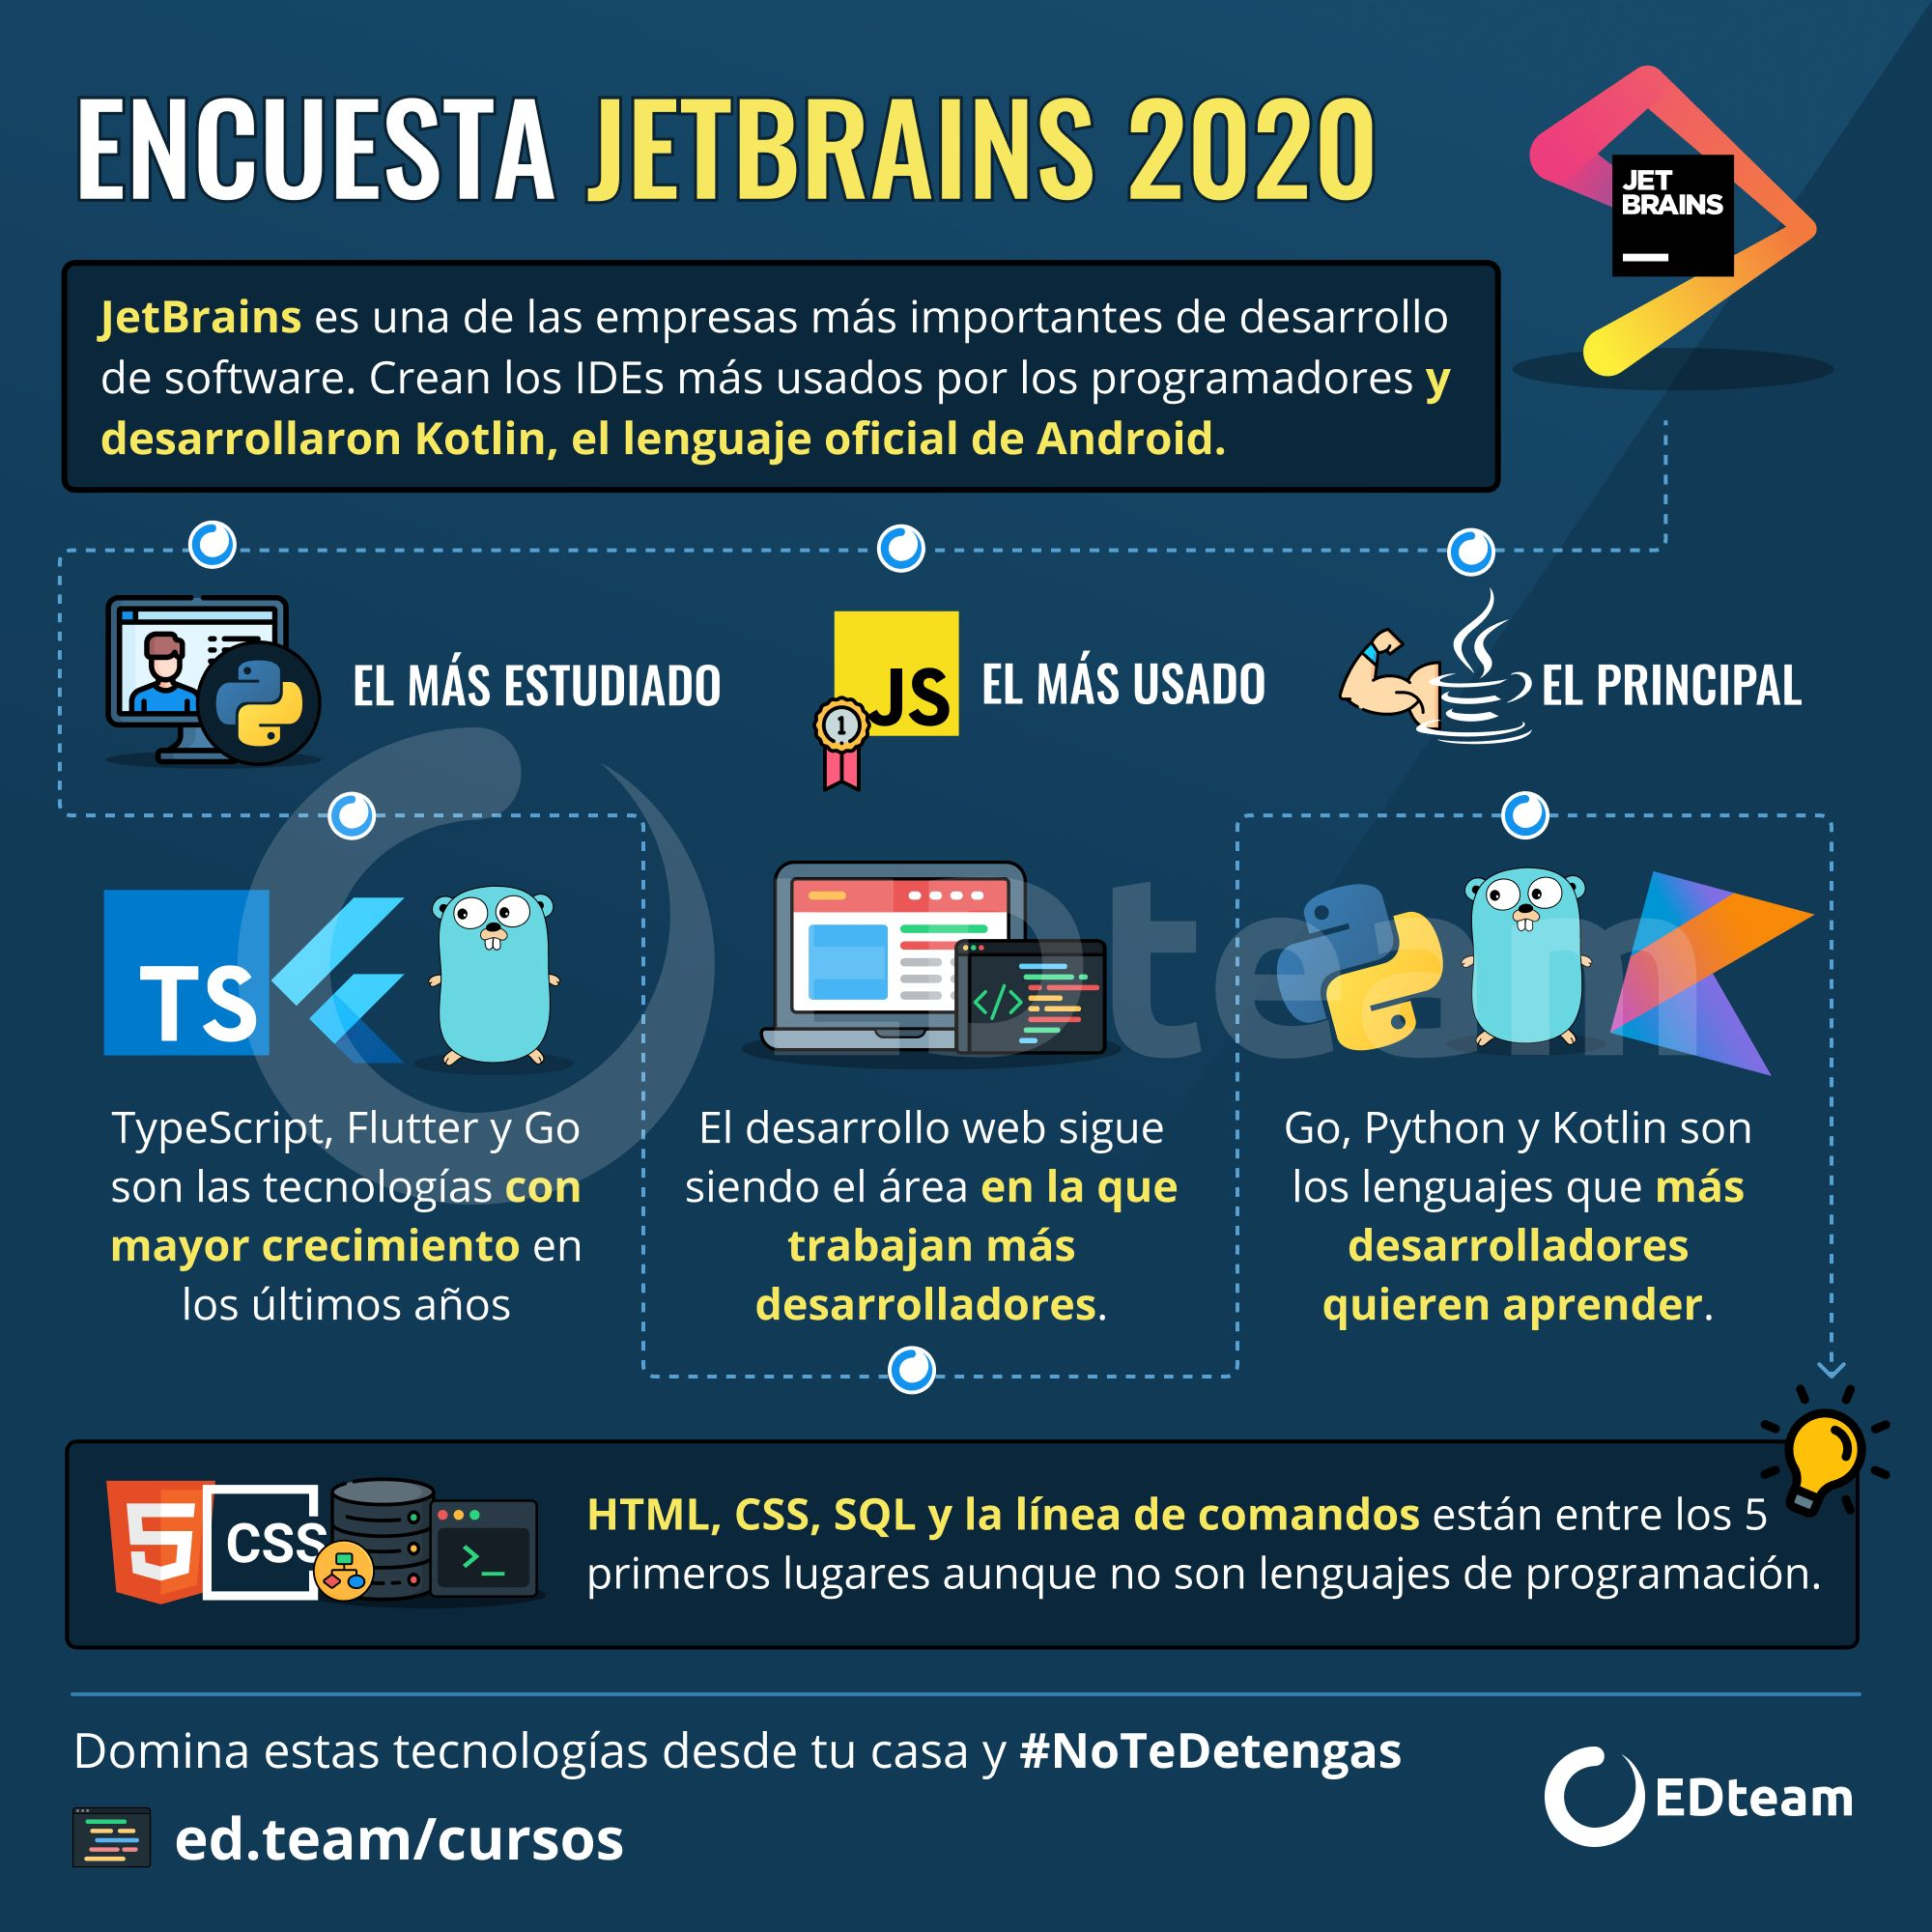 Encuesta Jetbrains 2020 Lenguaje De Programacion Informatica Programacion Programacion Orientada A Objetos